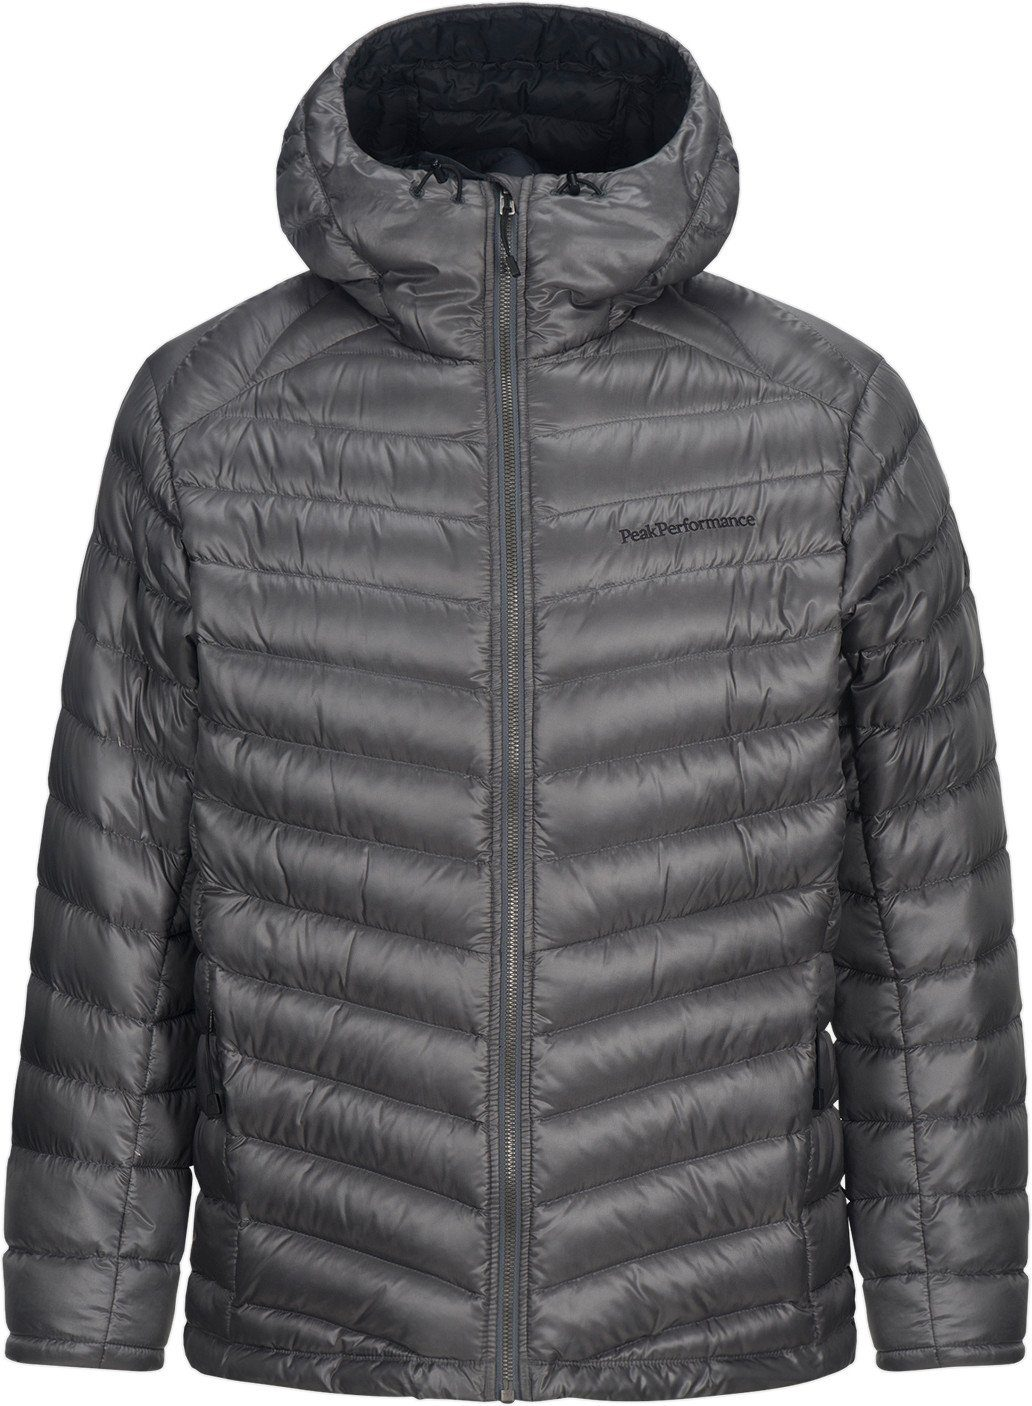 Peak Performance Outdoorjacke »Ice Down Hooded Jacket Herren« online kaufen   OTTO